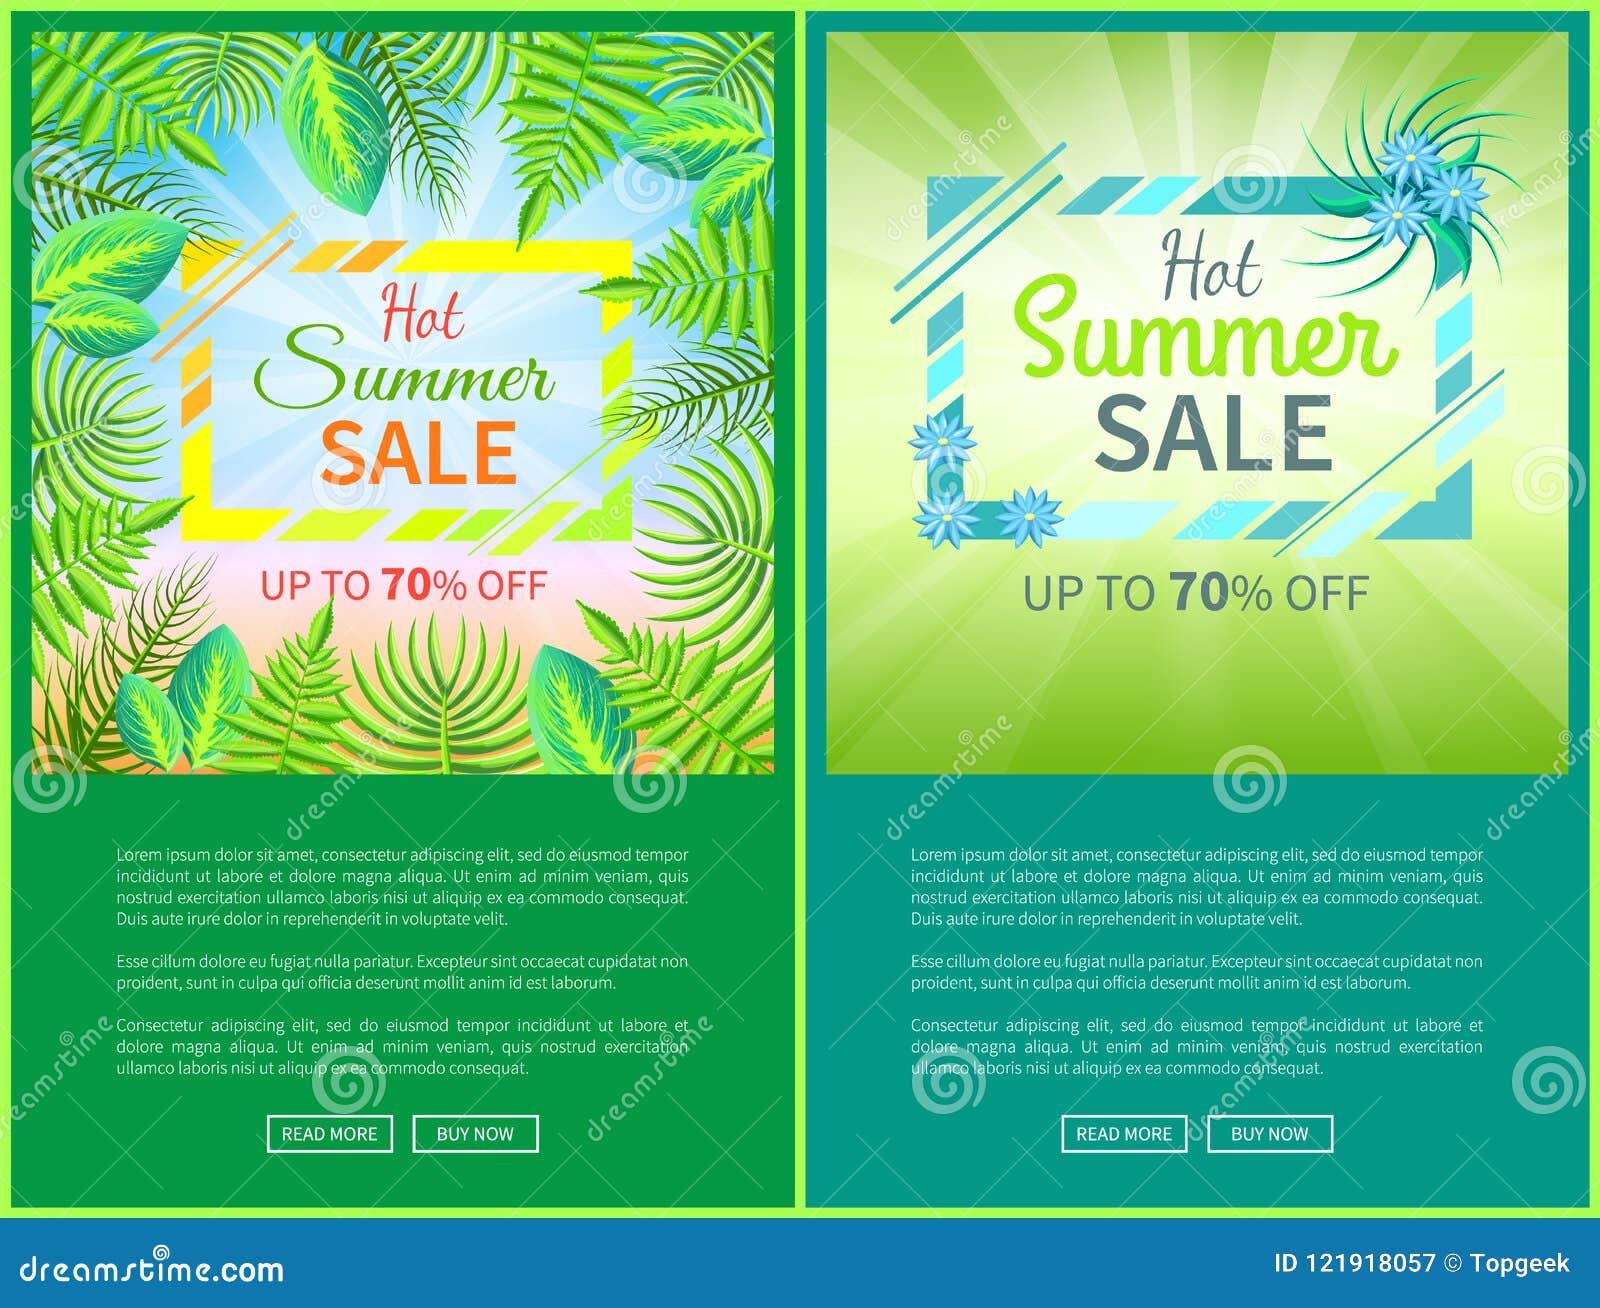 Hot Summer Sale Web Posters Set Up 70 Off Banner